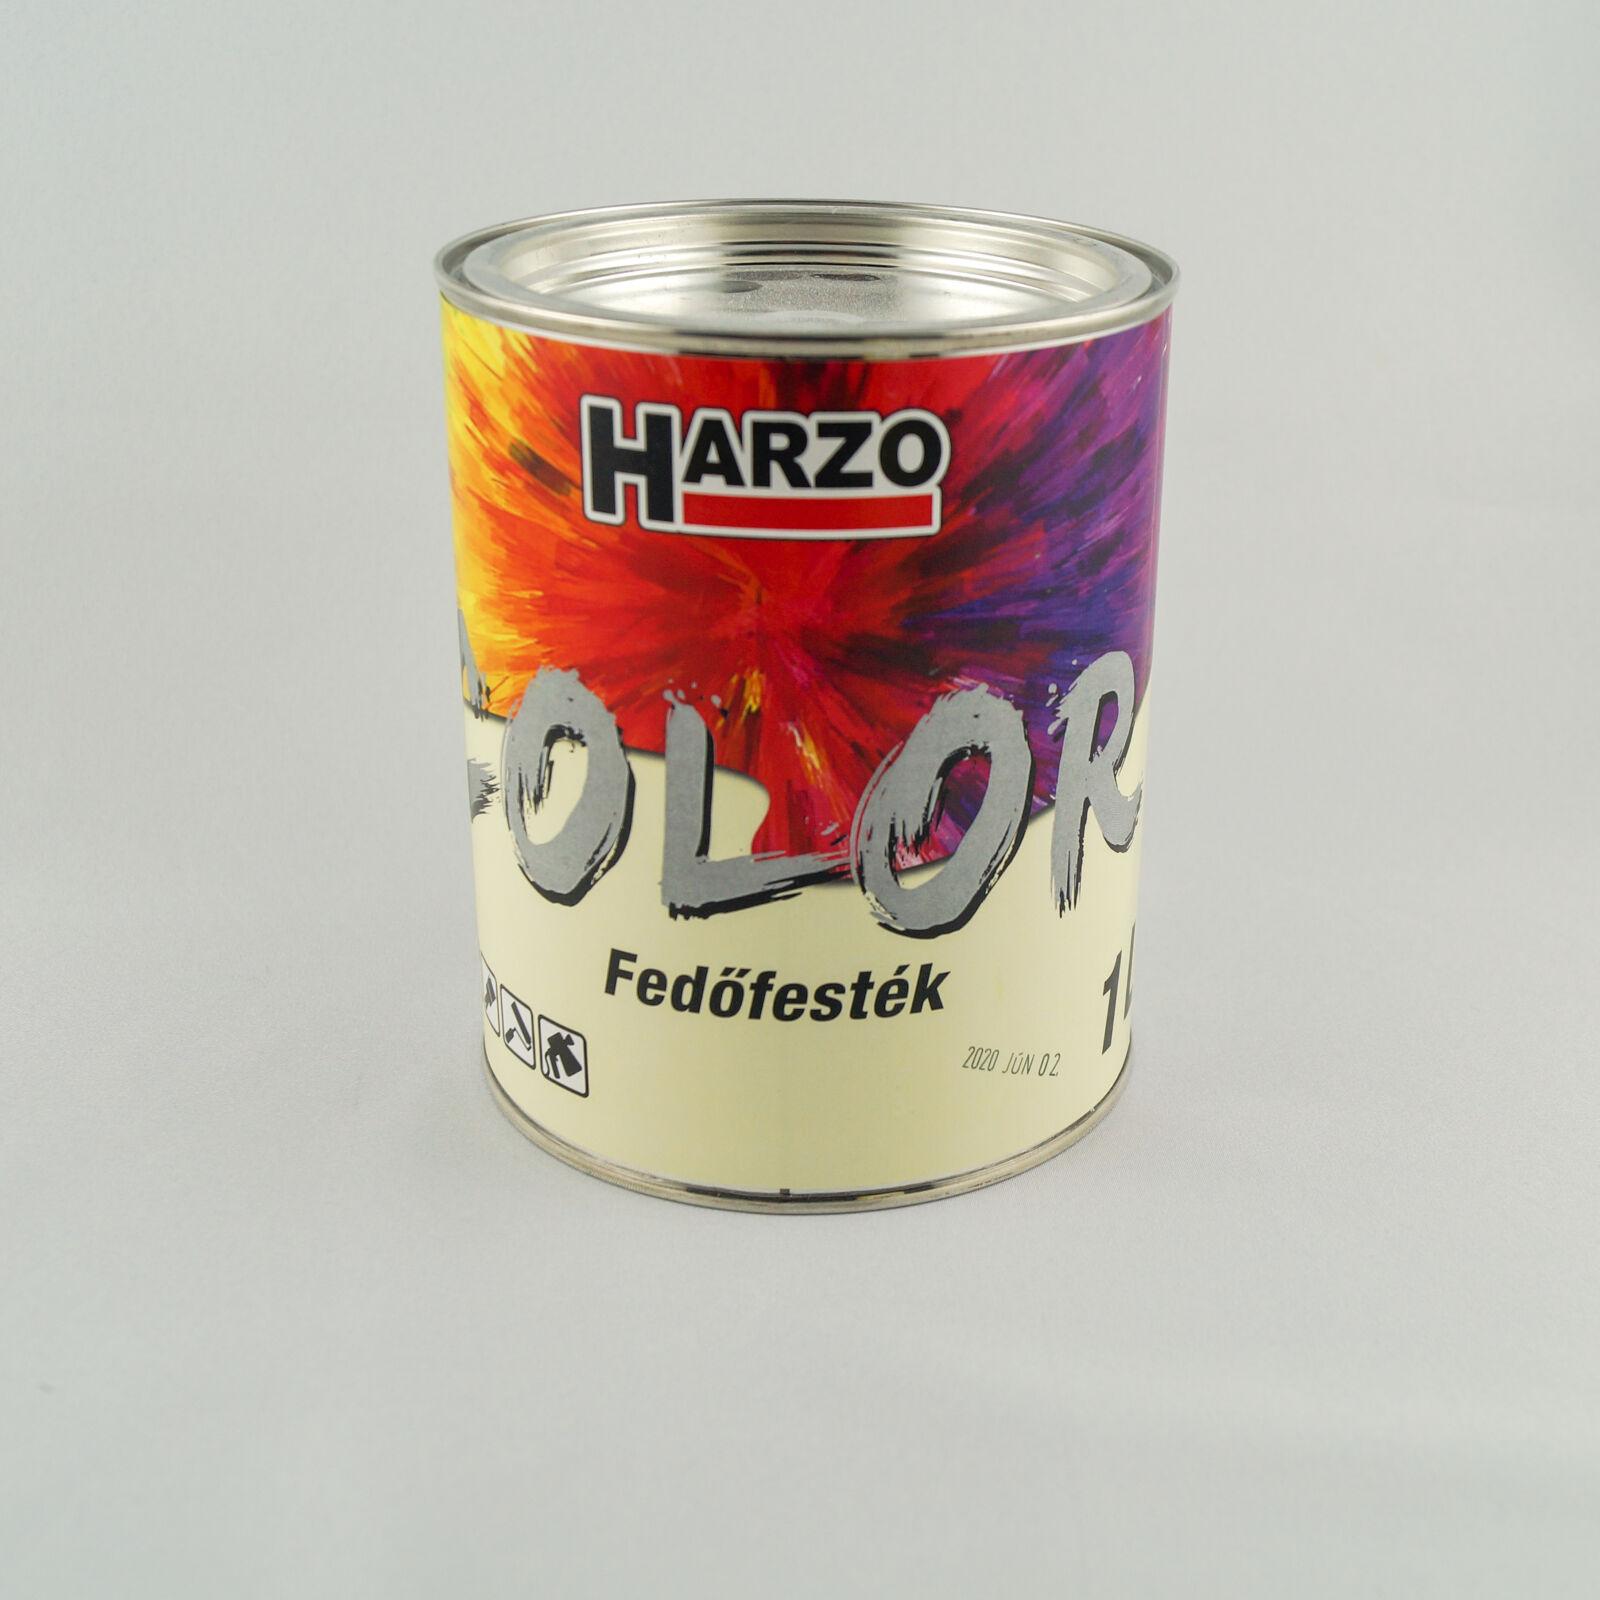 HARZO Color fedőfesték [1 lit]